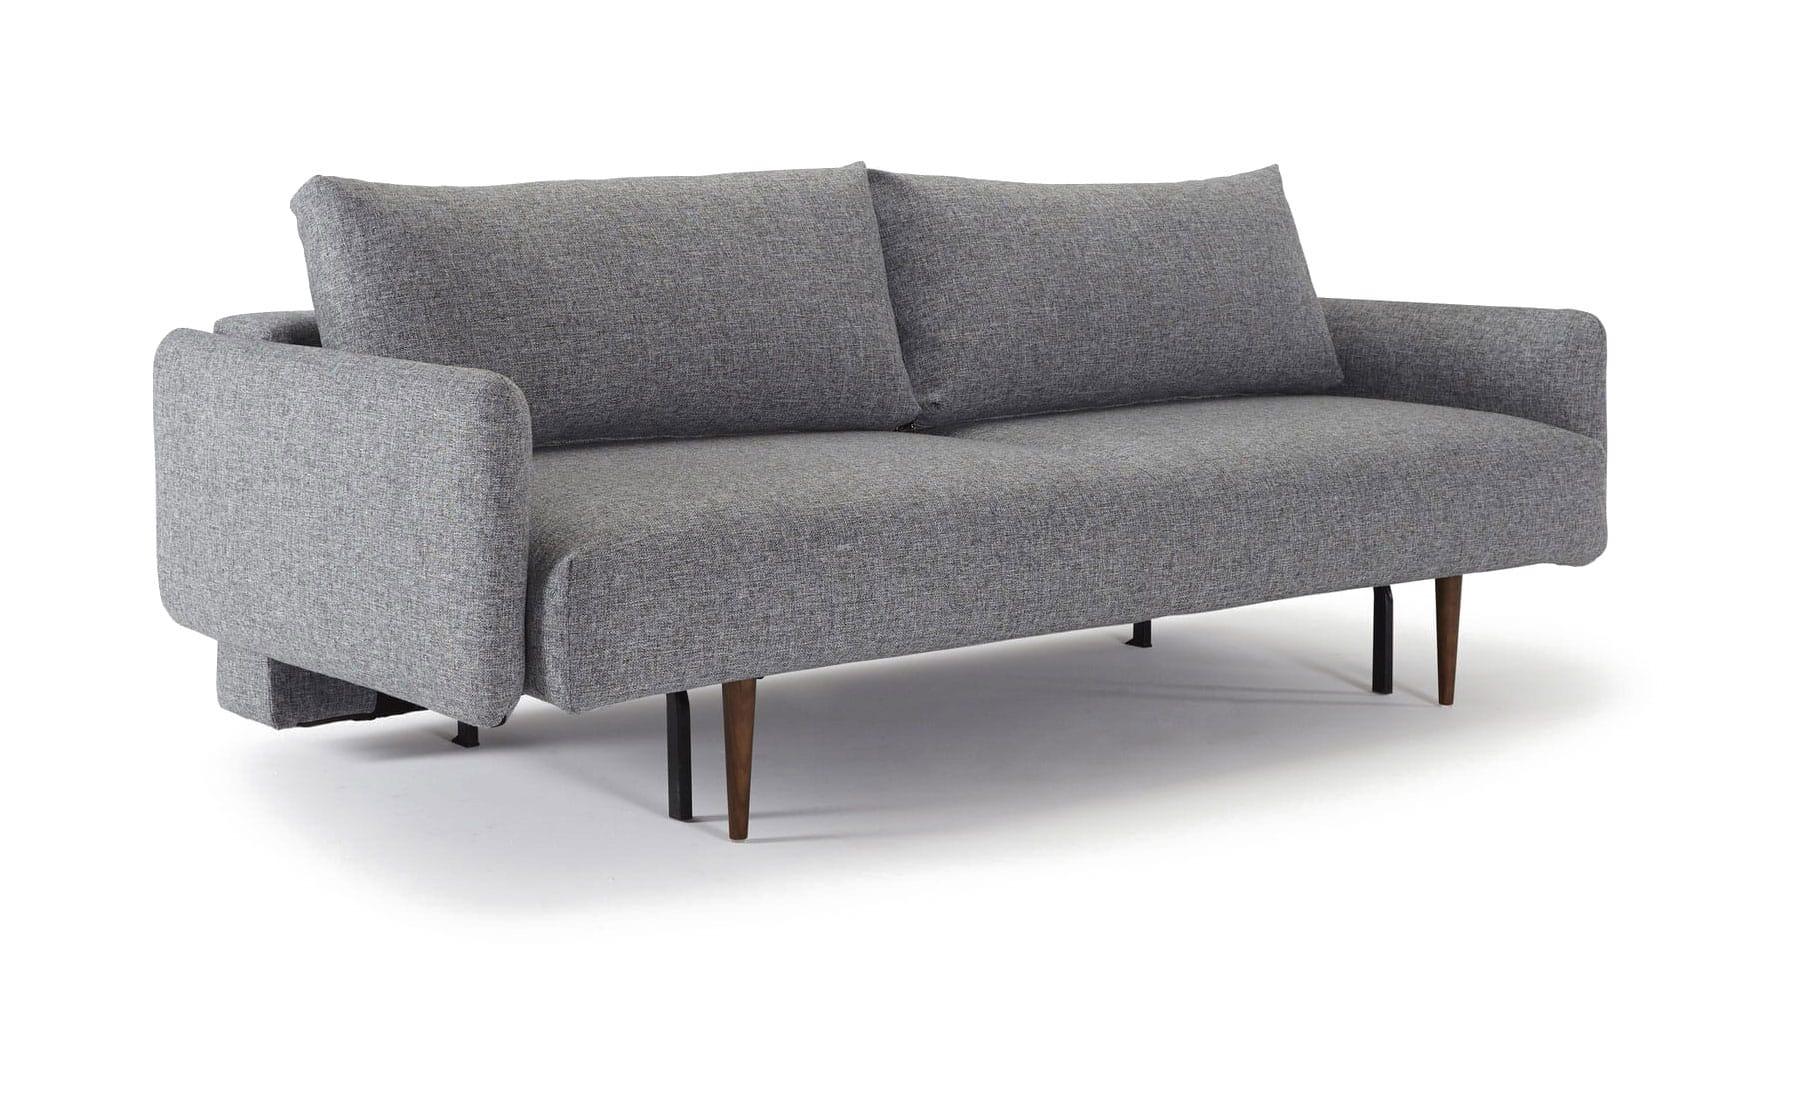 Pleasant Frode Sofa W Walnut Arms Twist Granite By Innovation Inzonedesignstudio Interior Chair Design Inzonedesignstudiocom